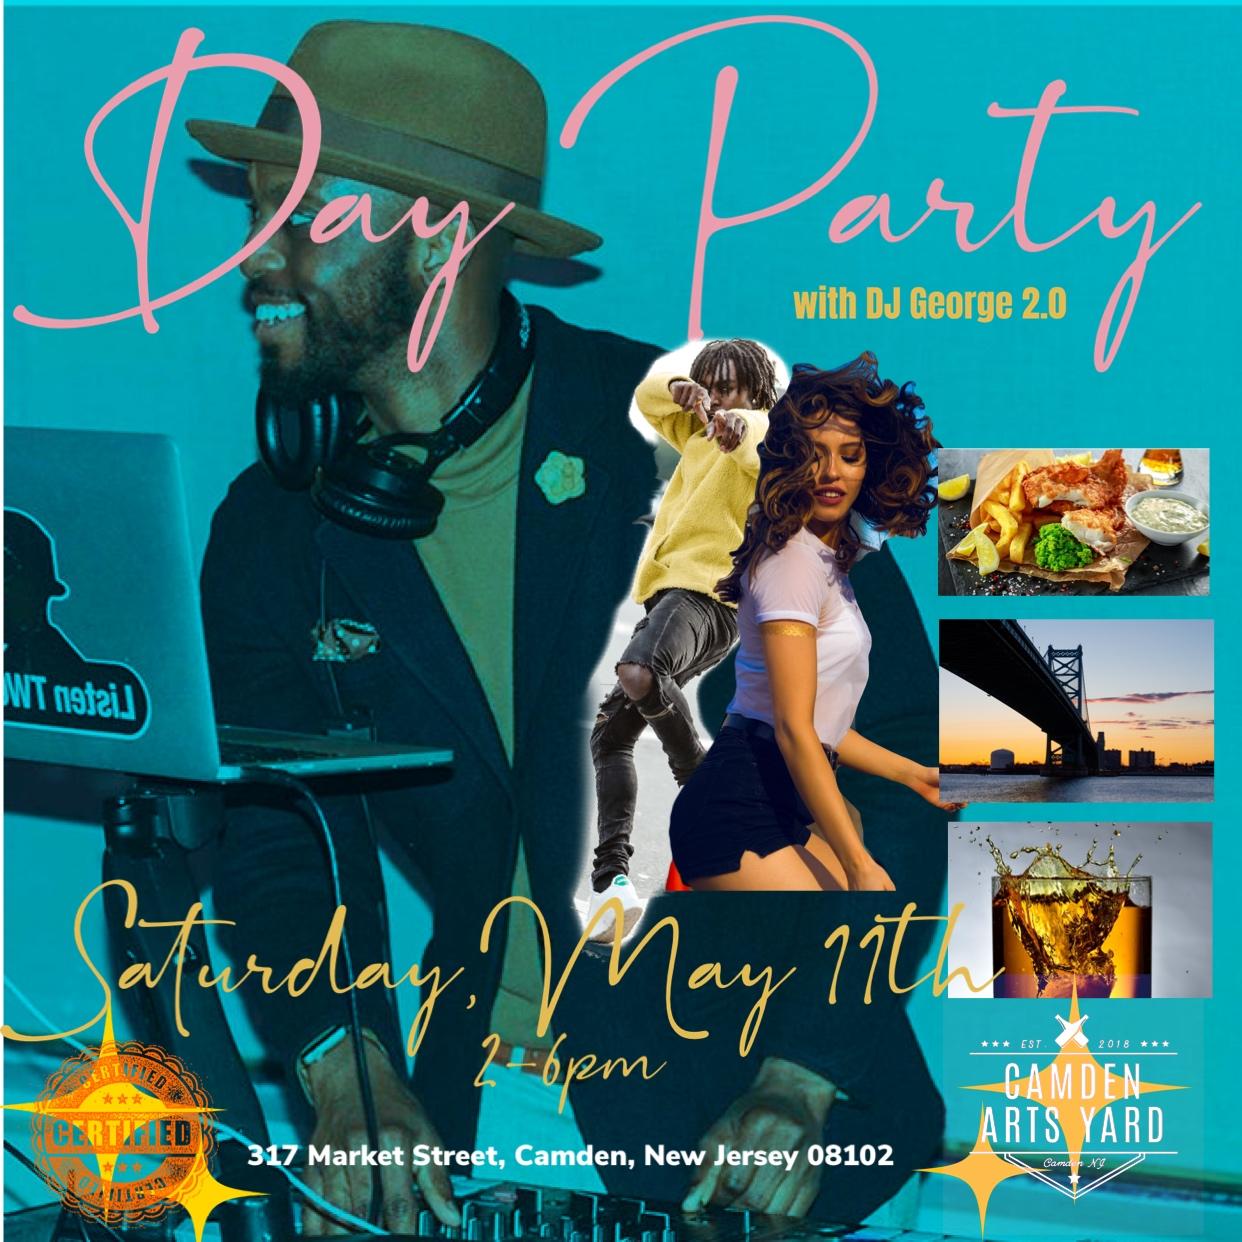 Day Party Flyer Camden Arts Yard